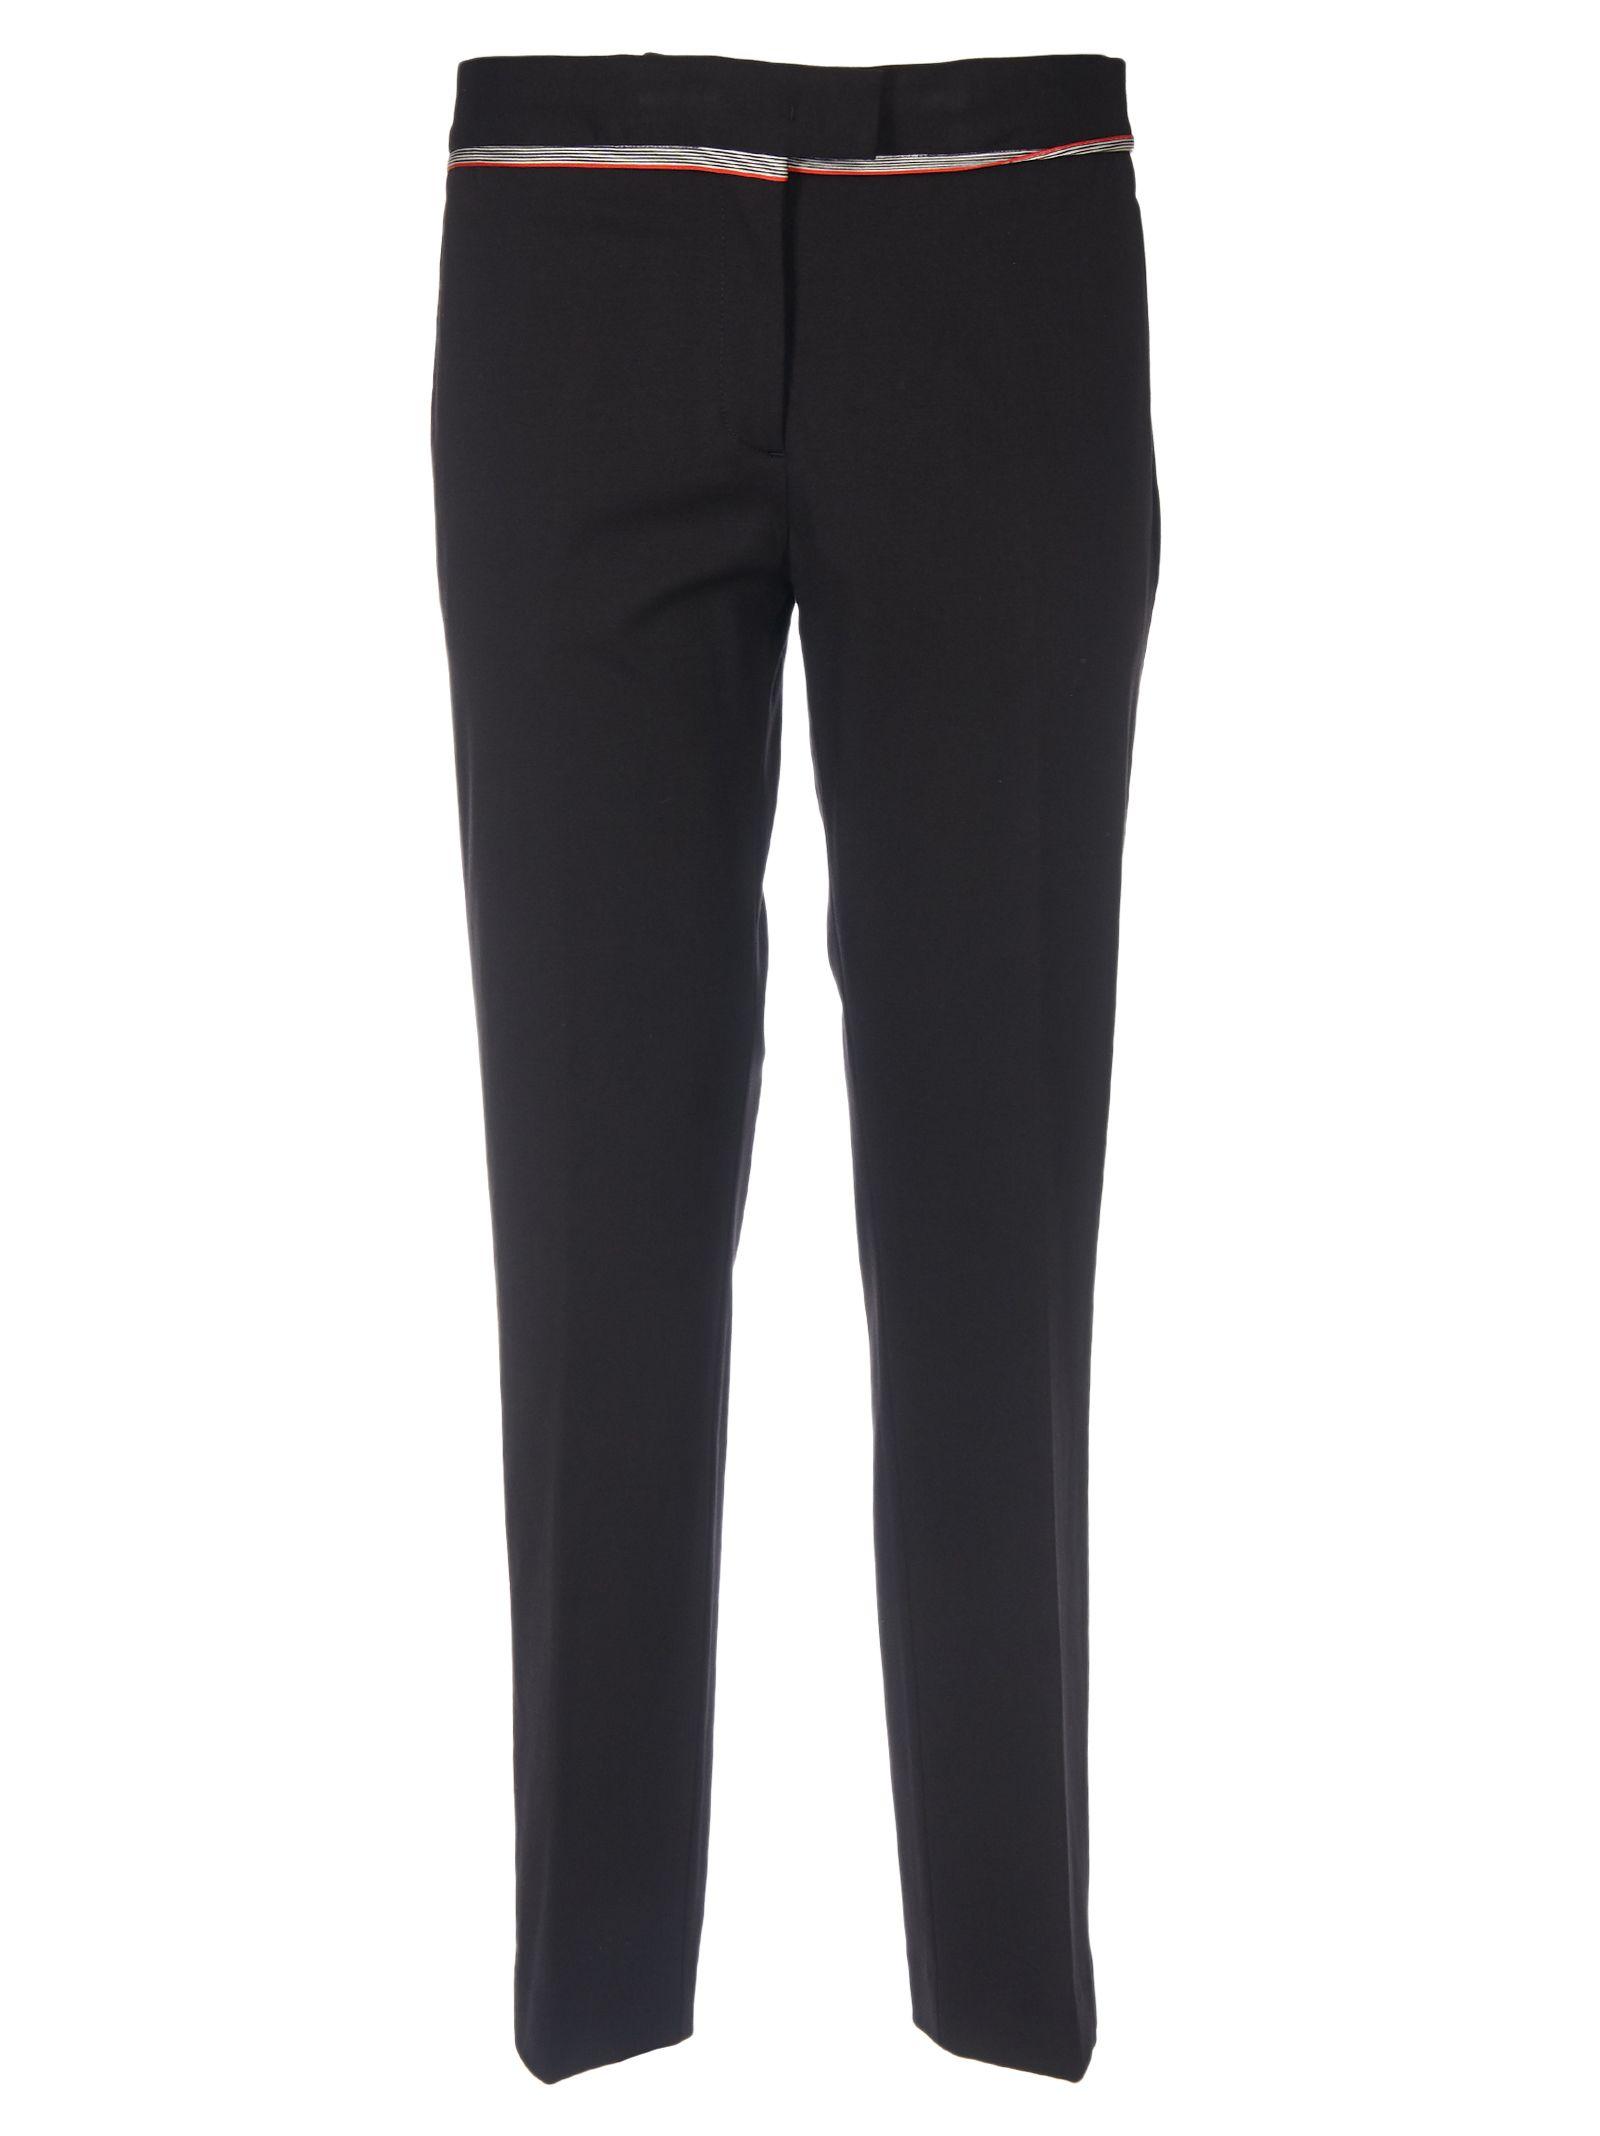 Paul Smith Skinny Trousers